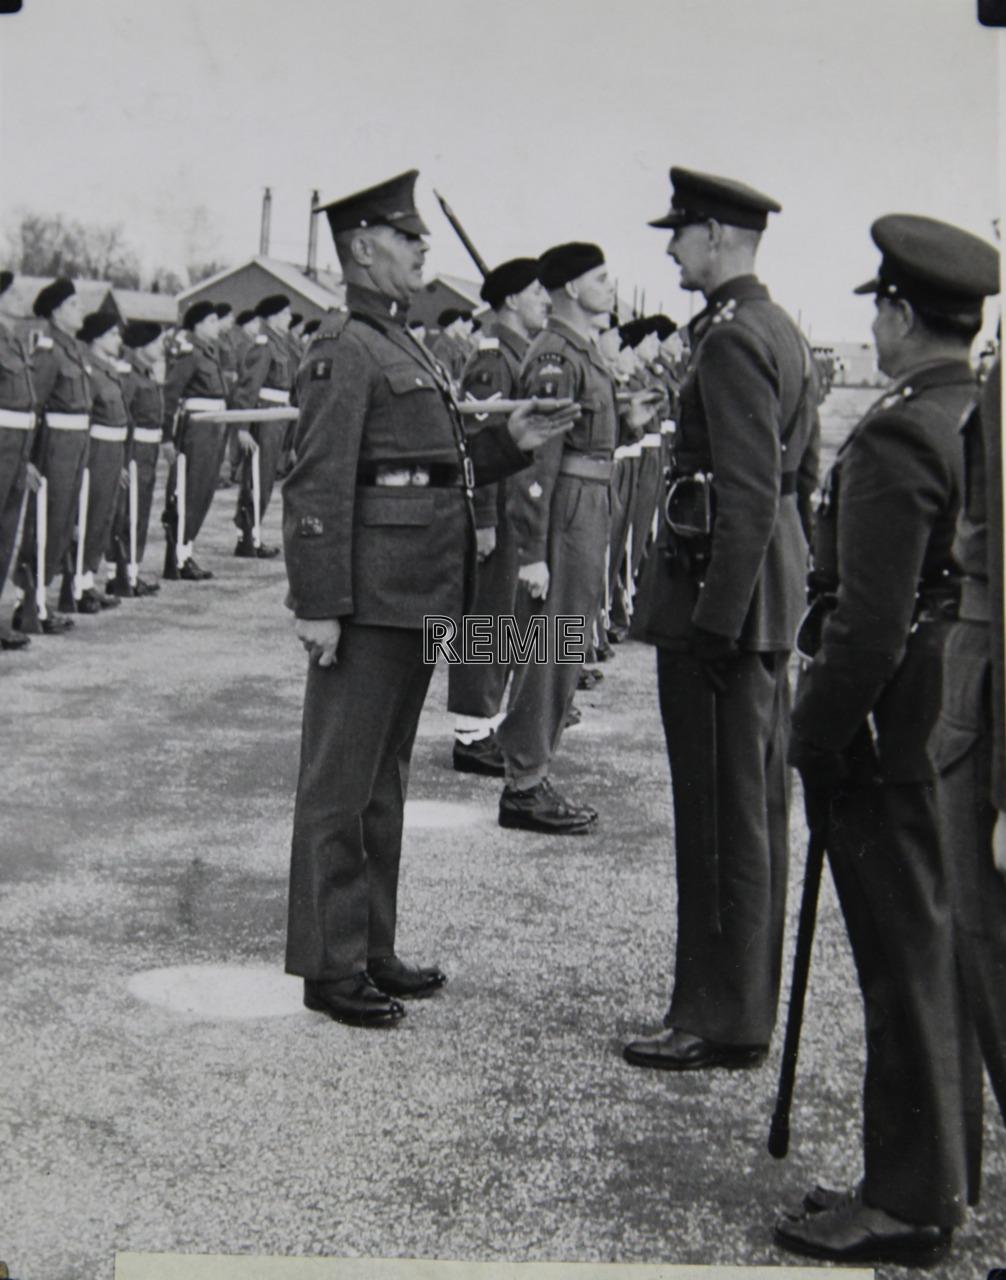 No 1 Training Battalion REME: 'A' Company Passing Out Parade